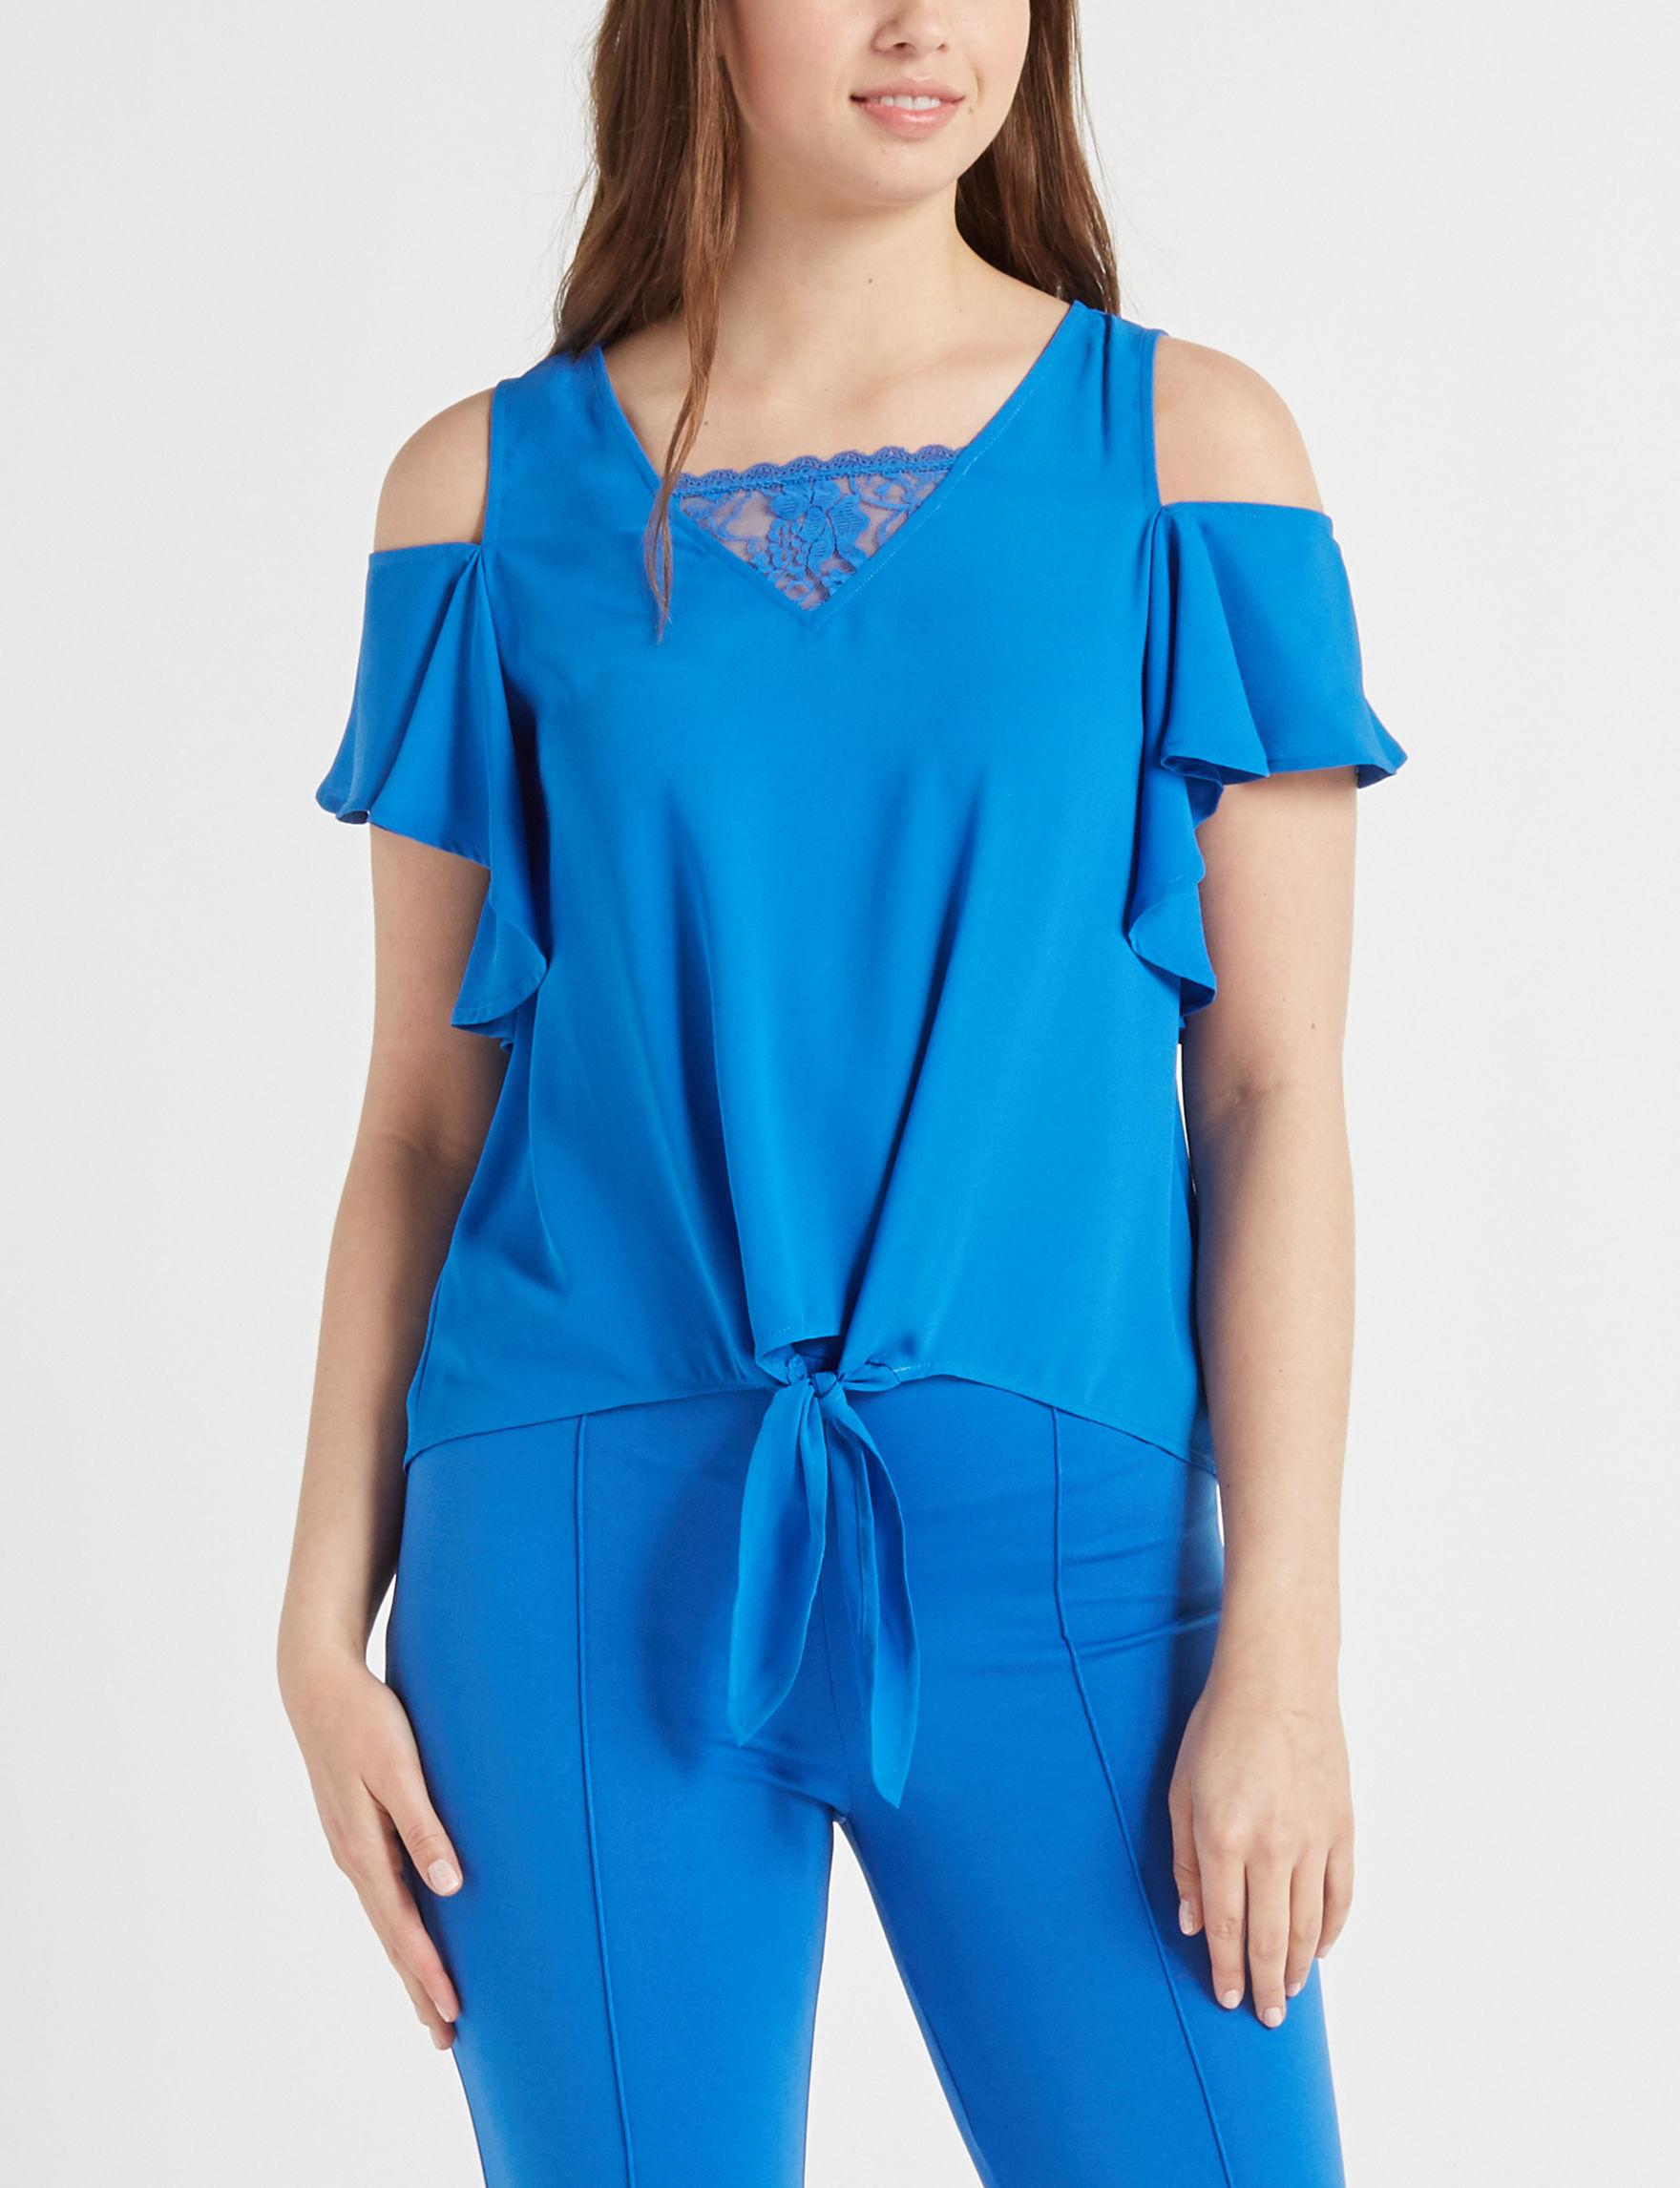 XOXO Royal Blue Shirts & Blouses